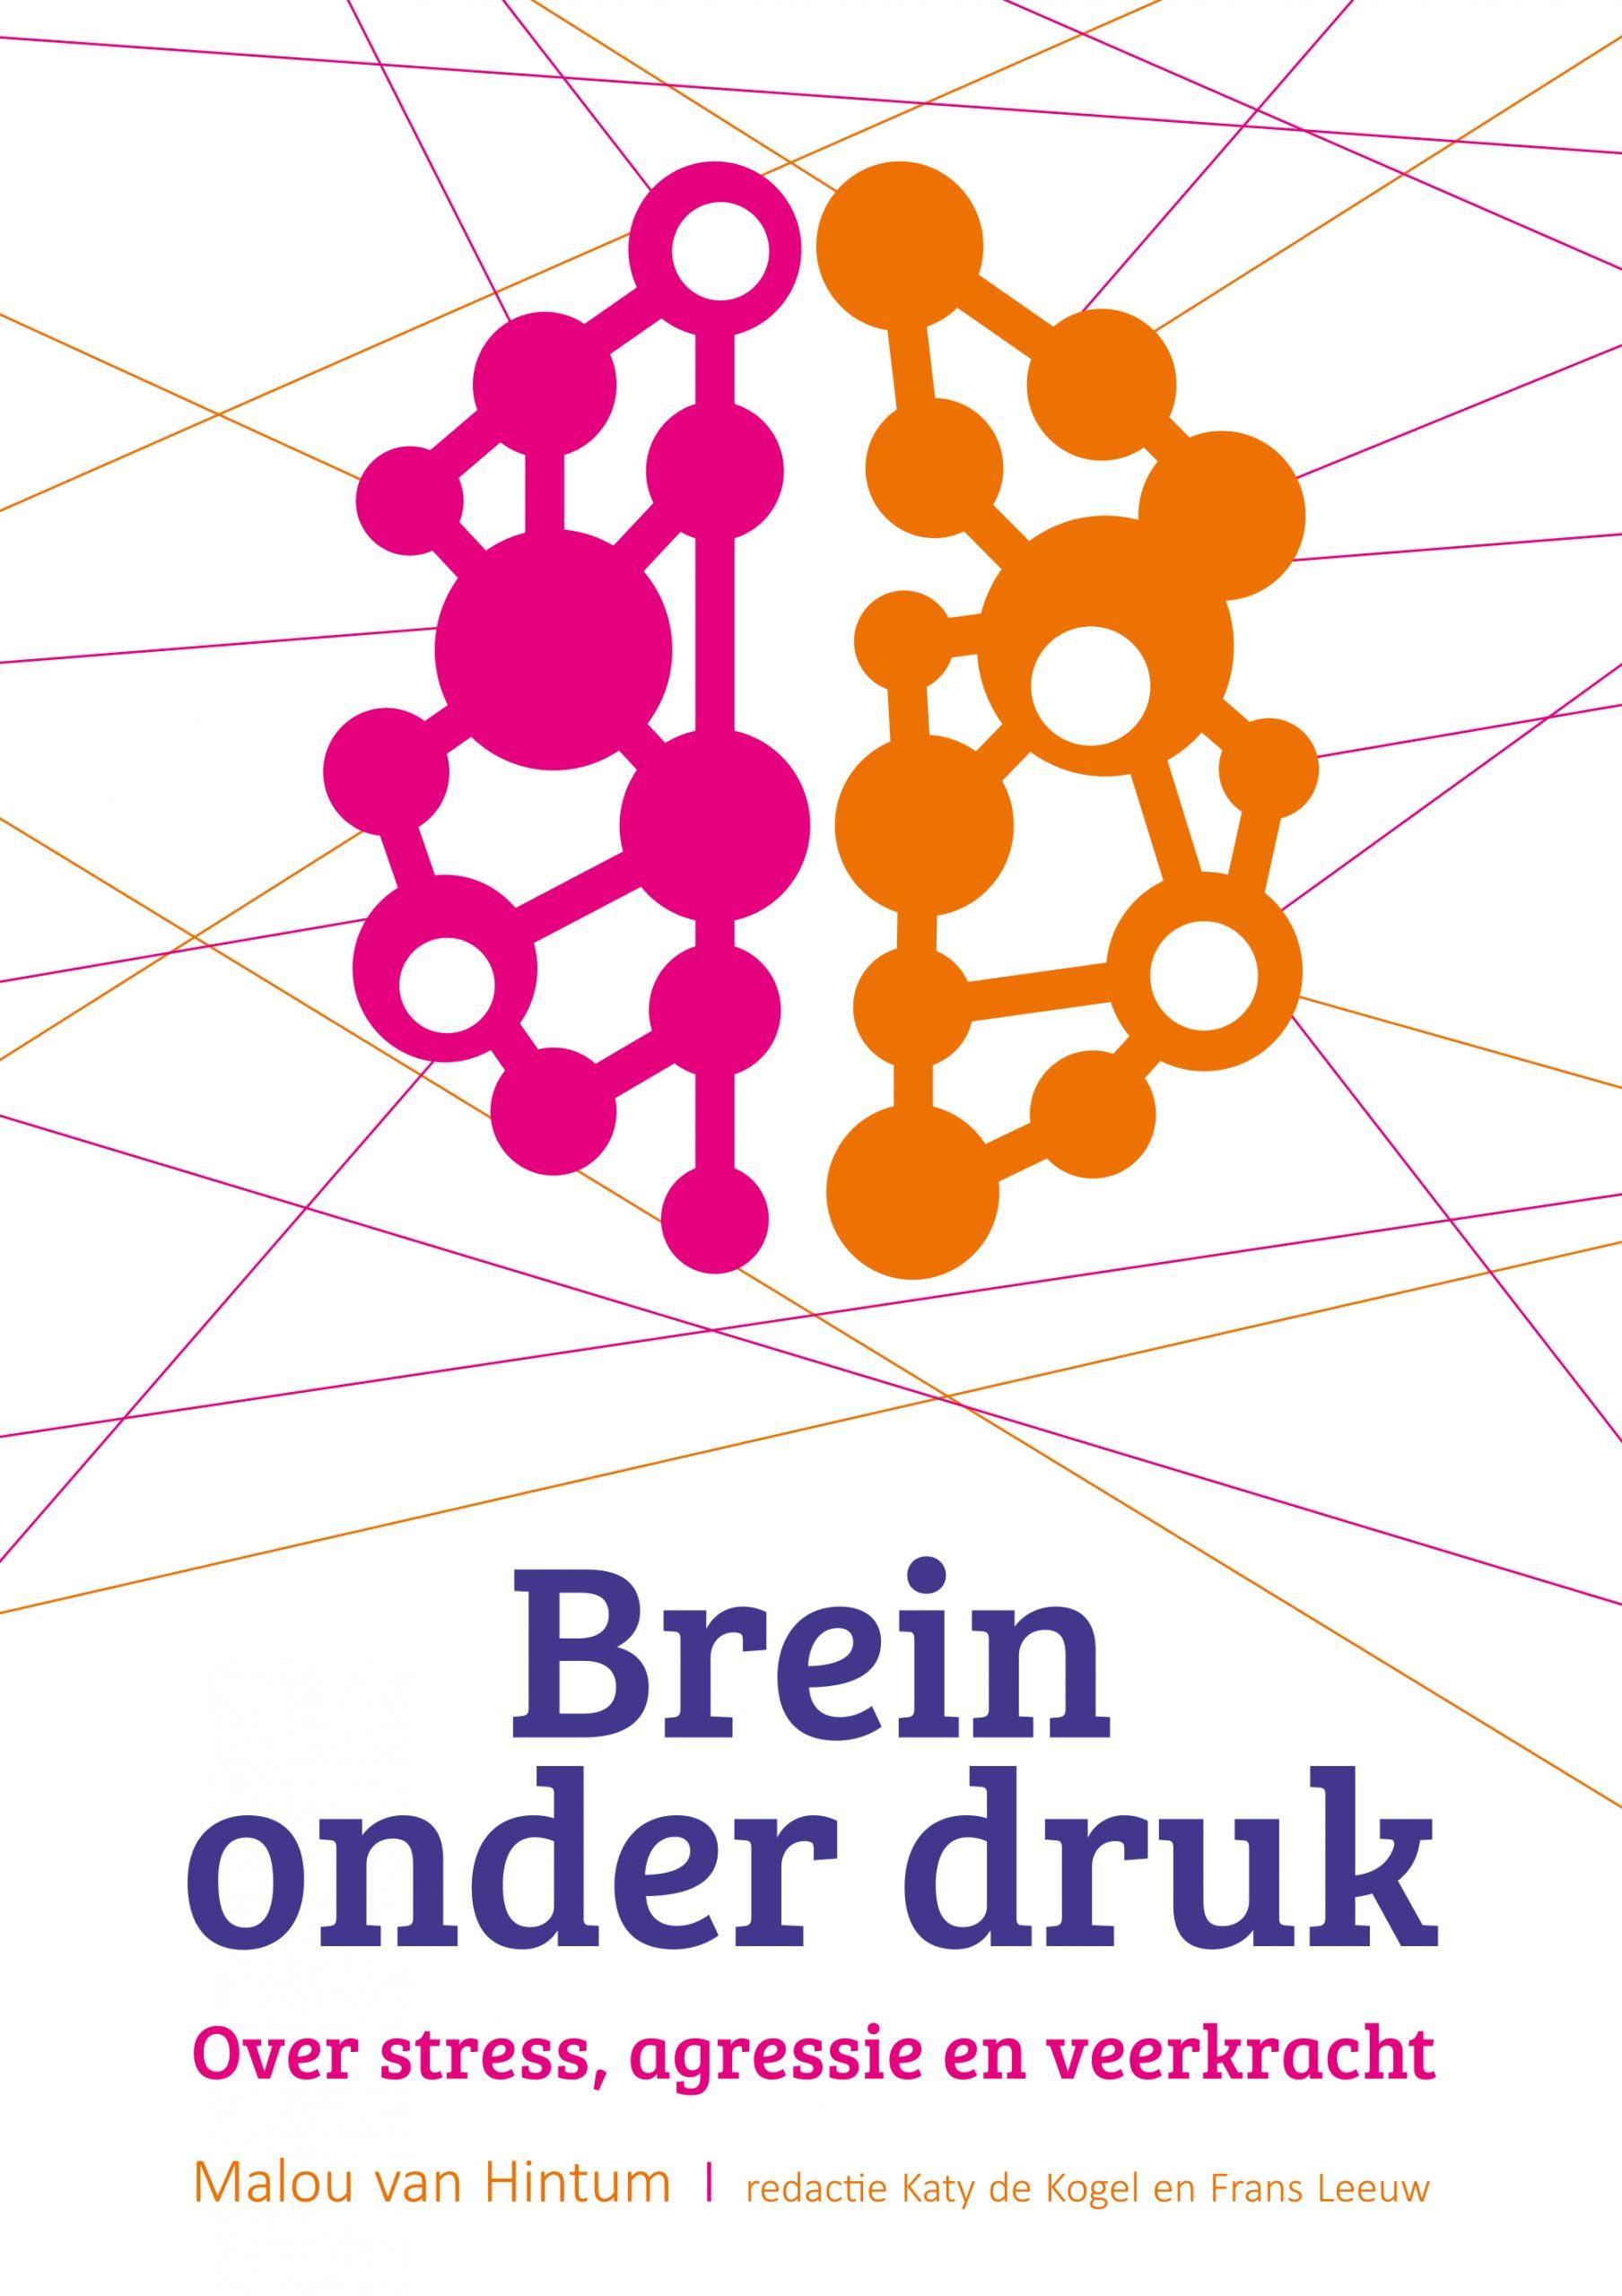 SWP Brein onder druk scaled